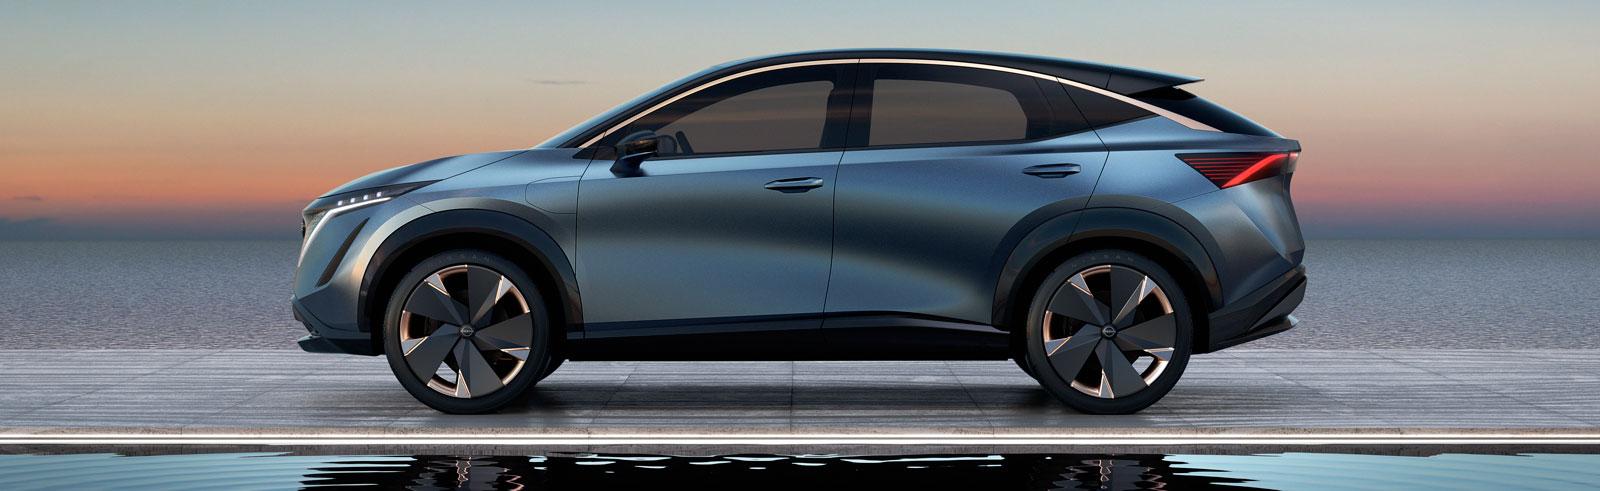 Nissan Ariya will be presented on July 15